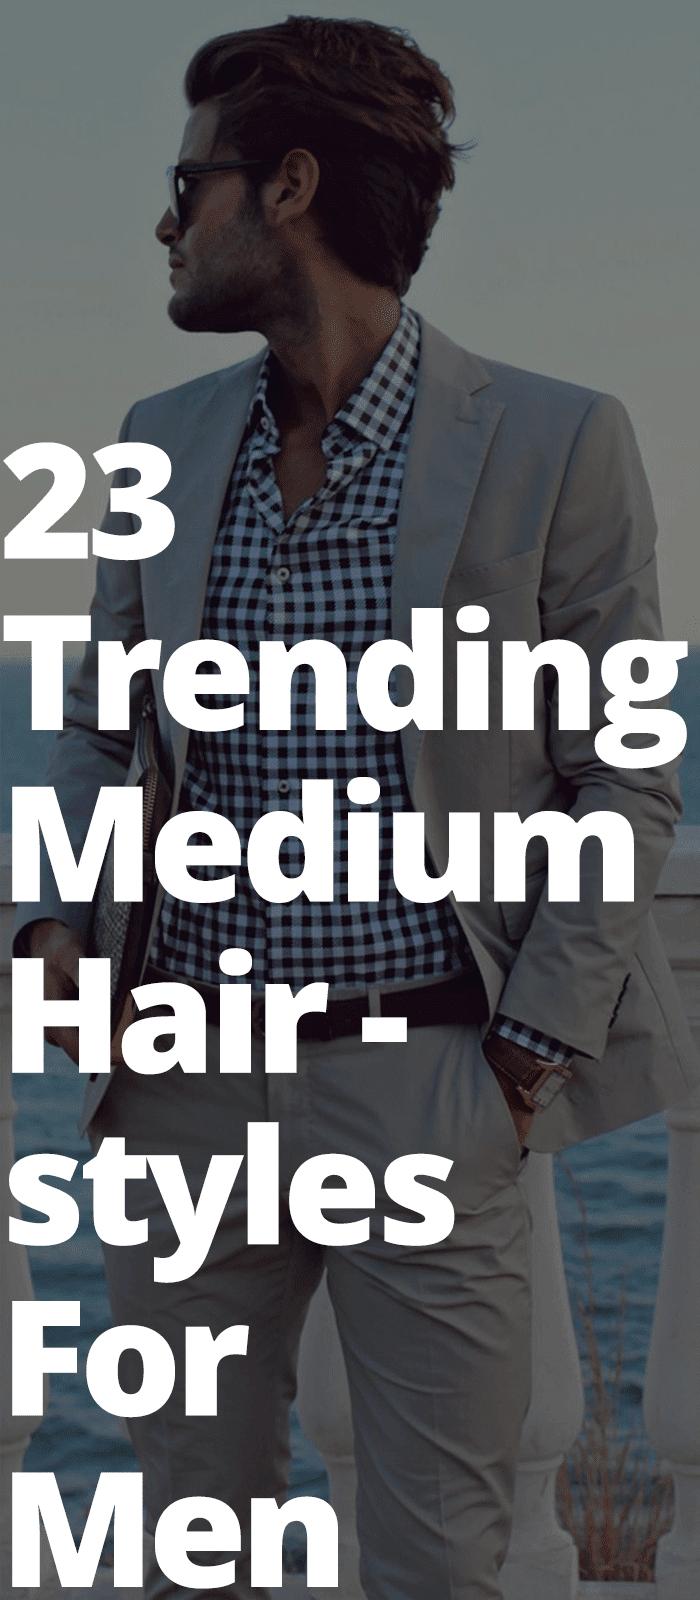 Trending Medium Hairstyles